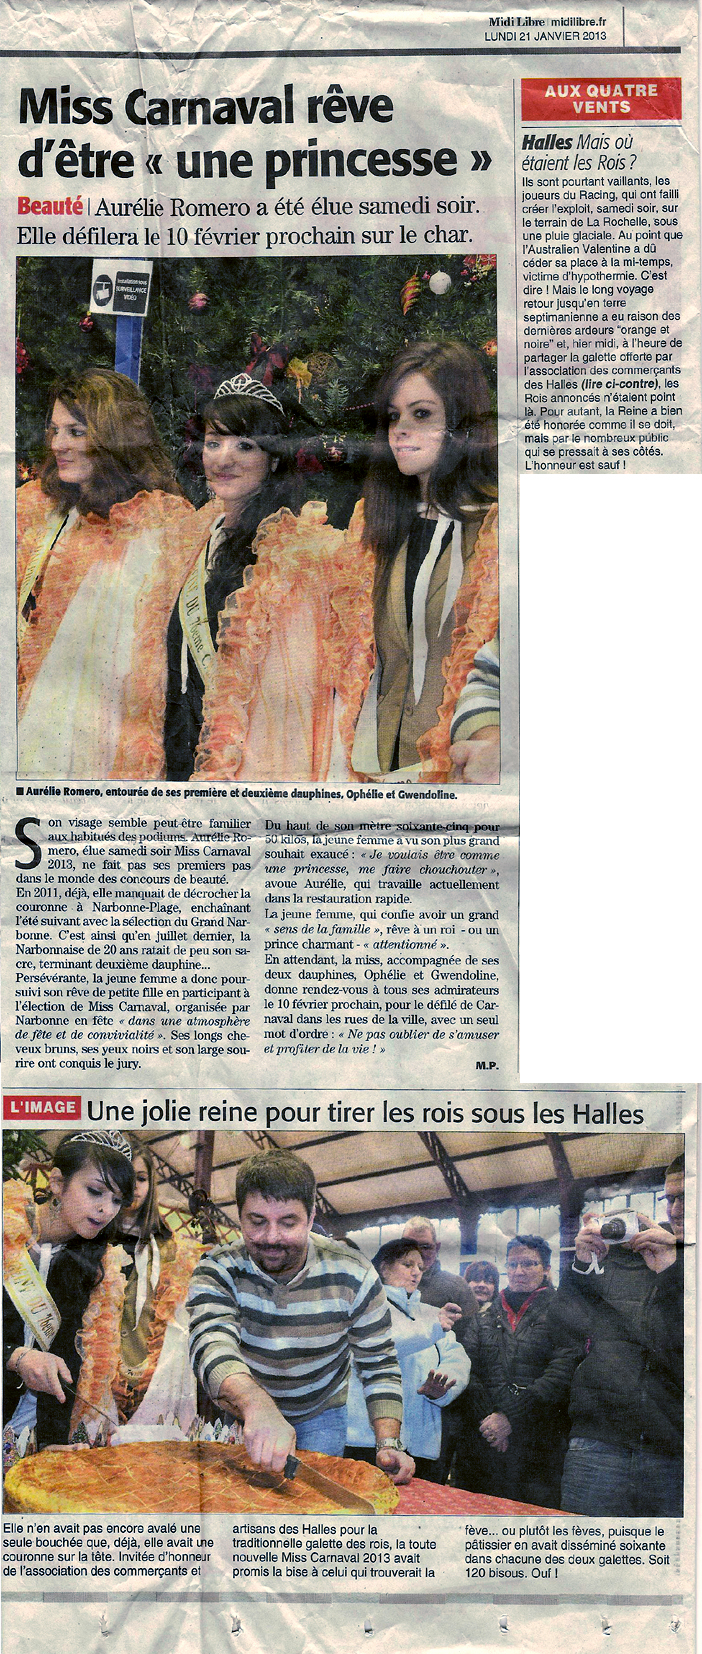 ceremonie_voeux_galette_rois_reine_carnaval_halles_de_narbonne_21-01-2013